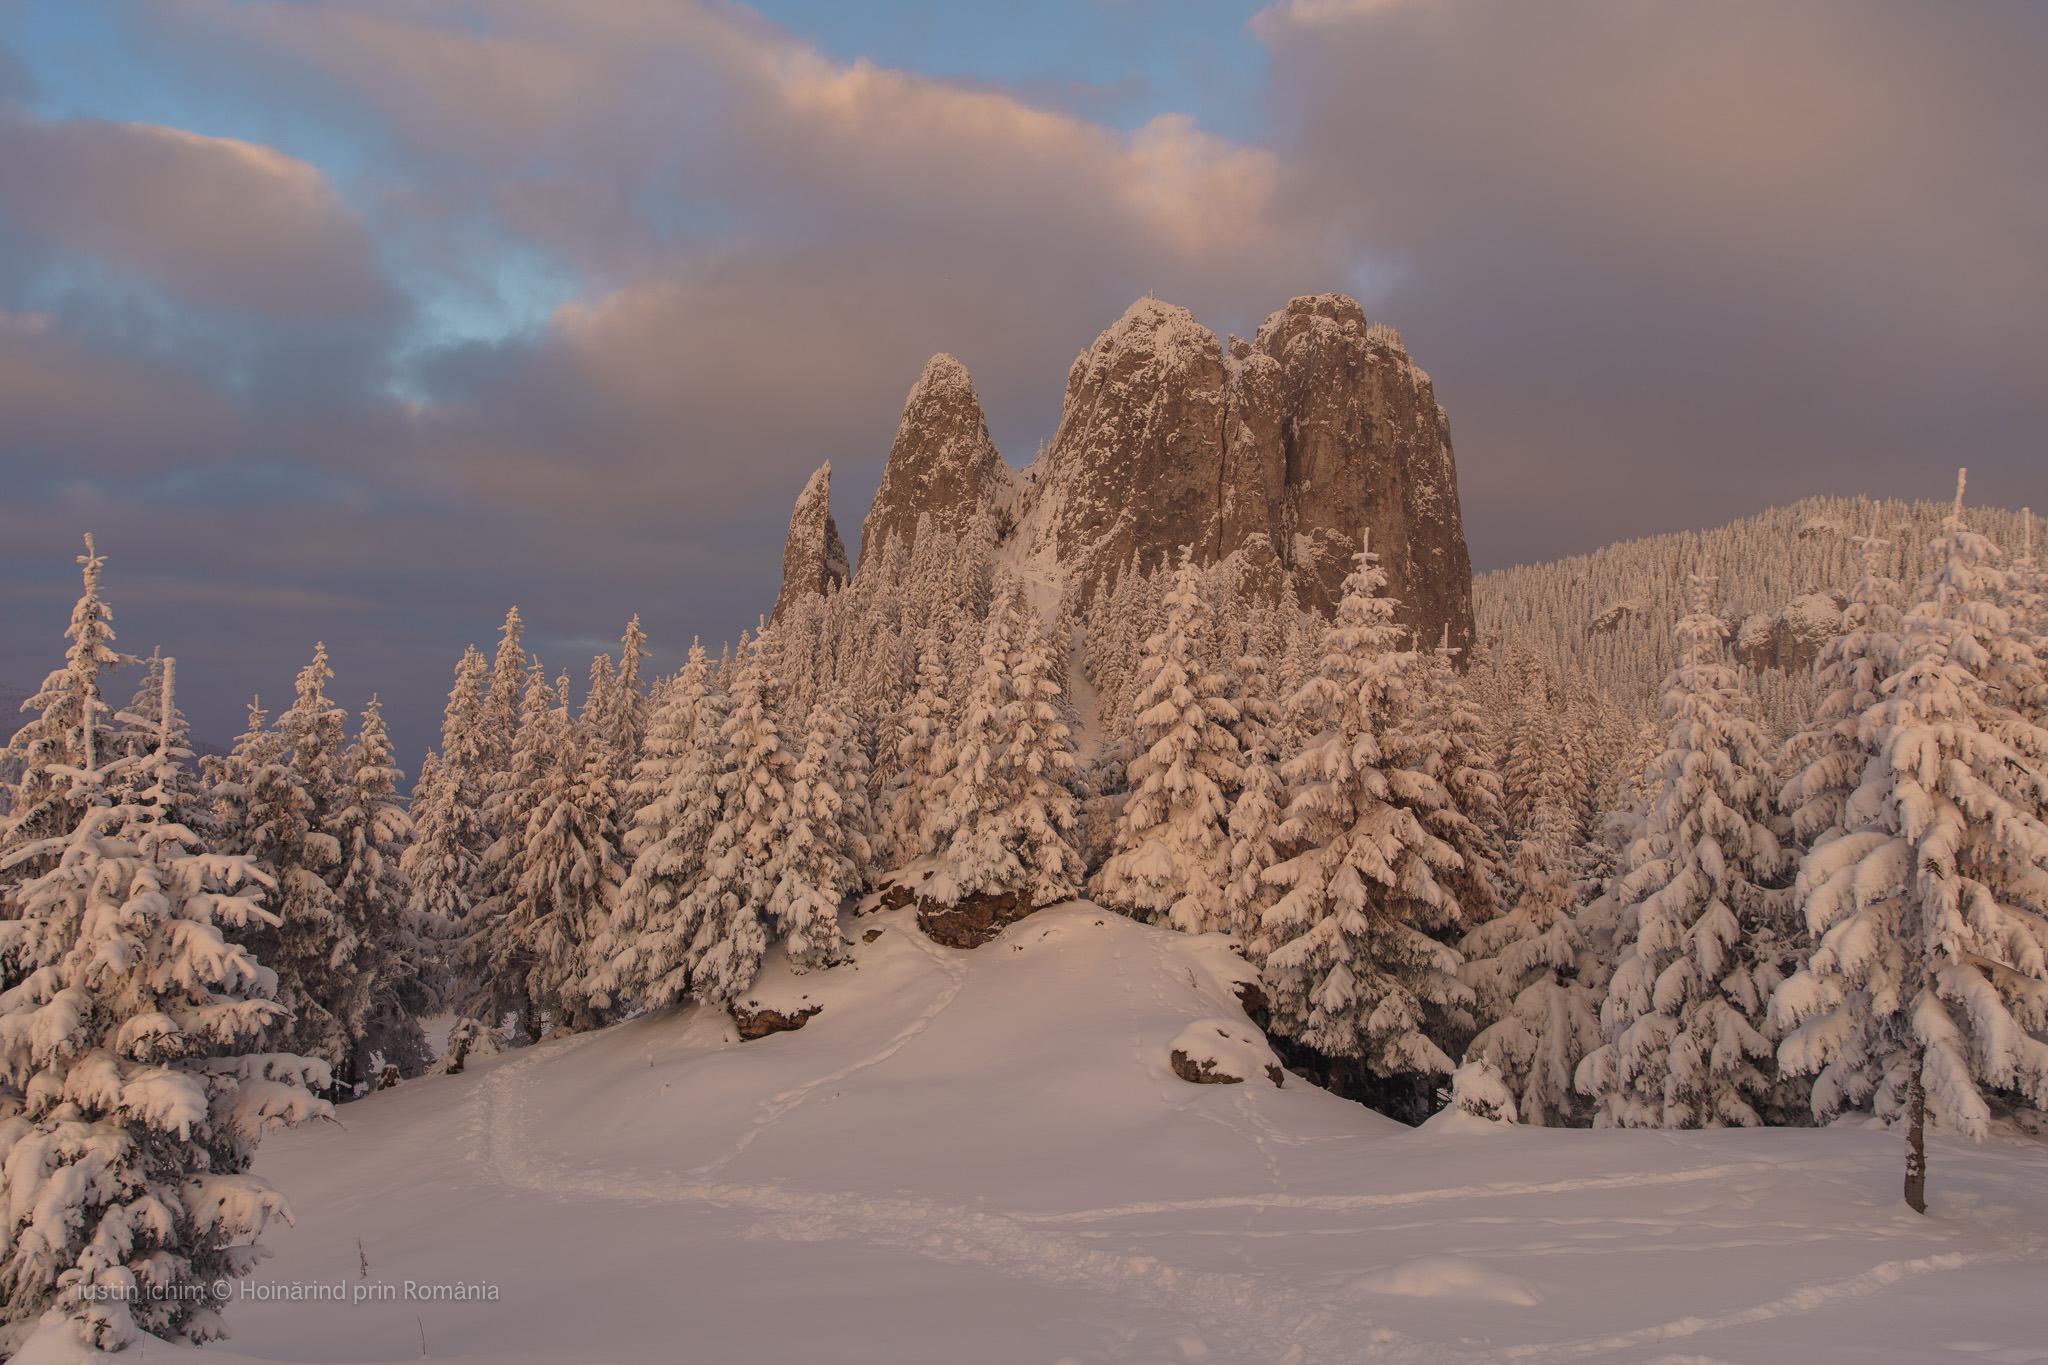 Romania, peisaj de iarna Piatra Singuratică, Muntii Hășmaș